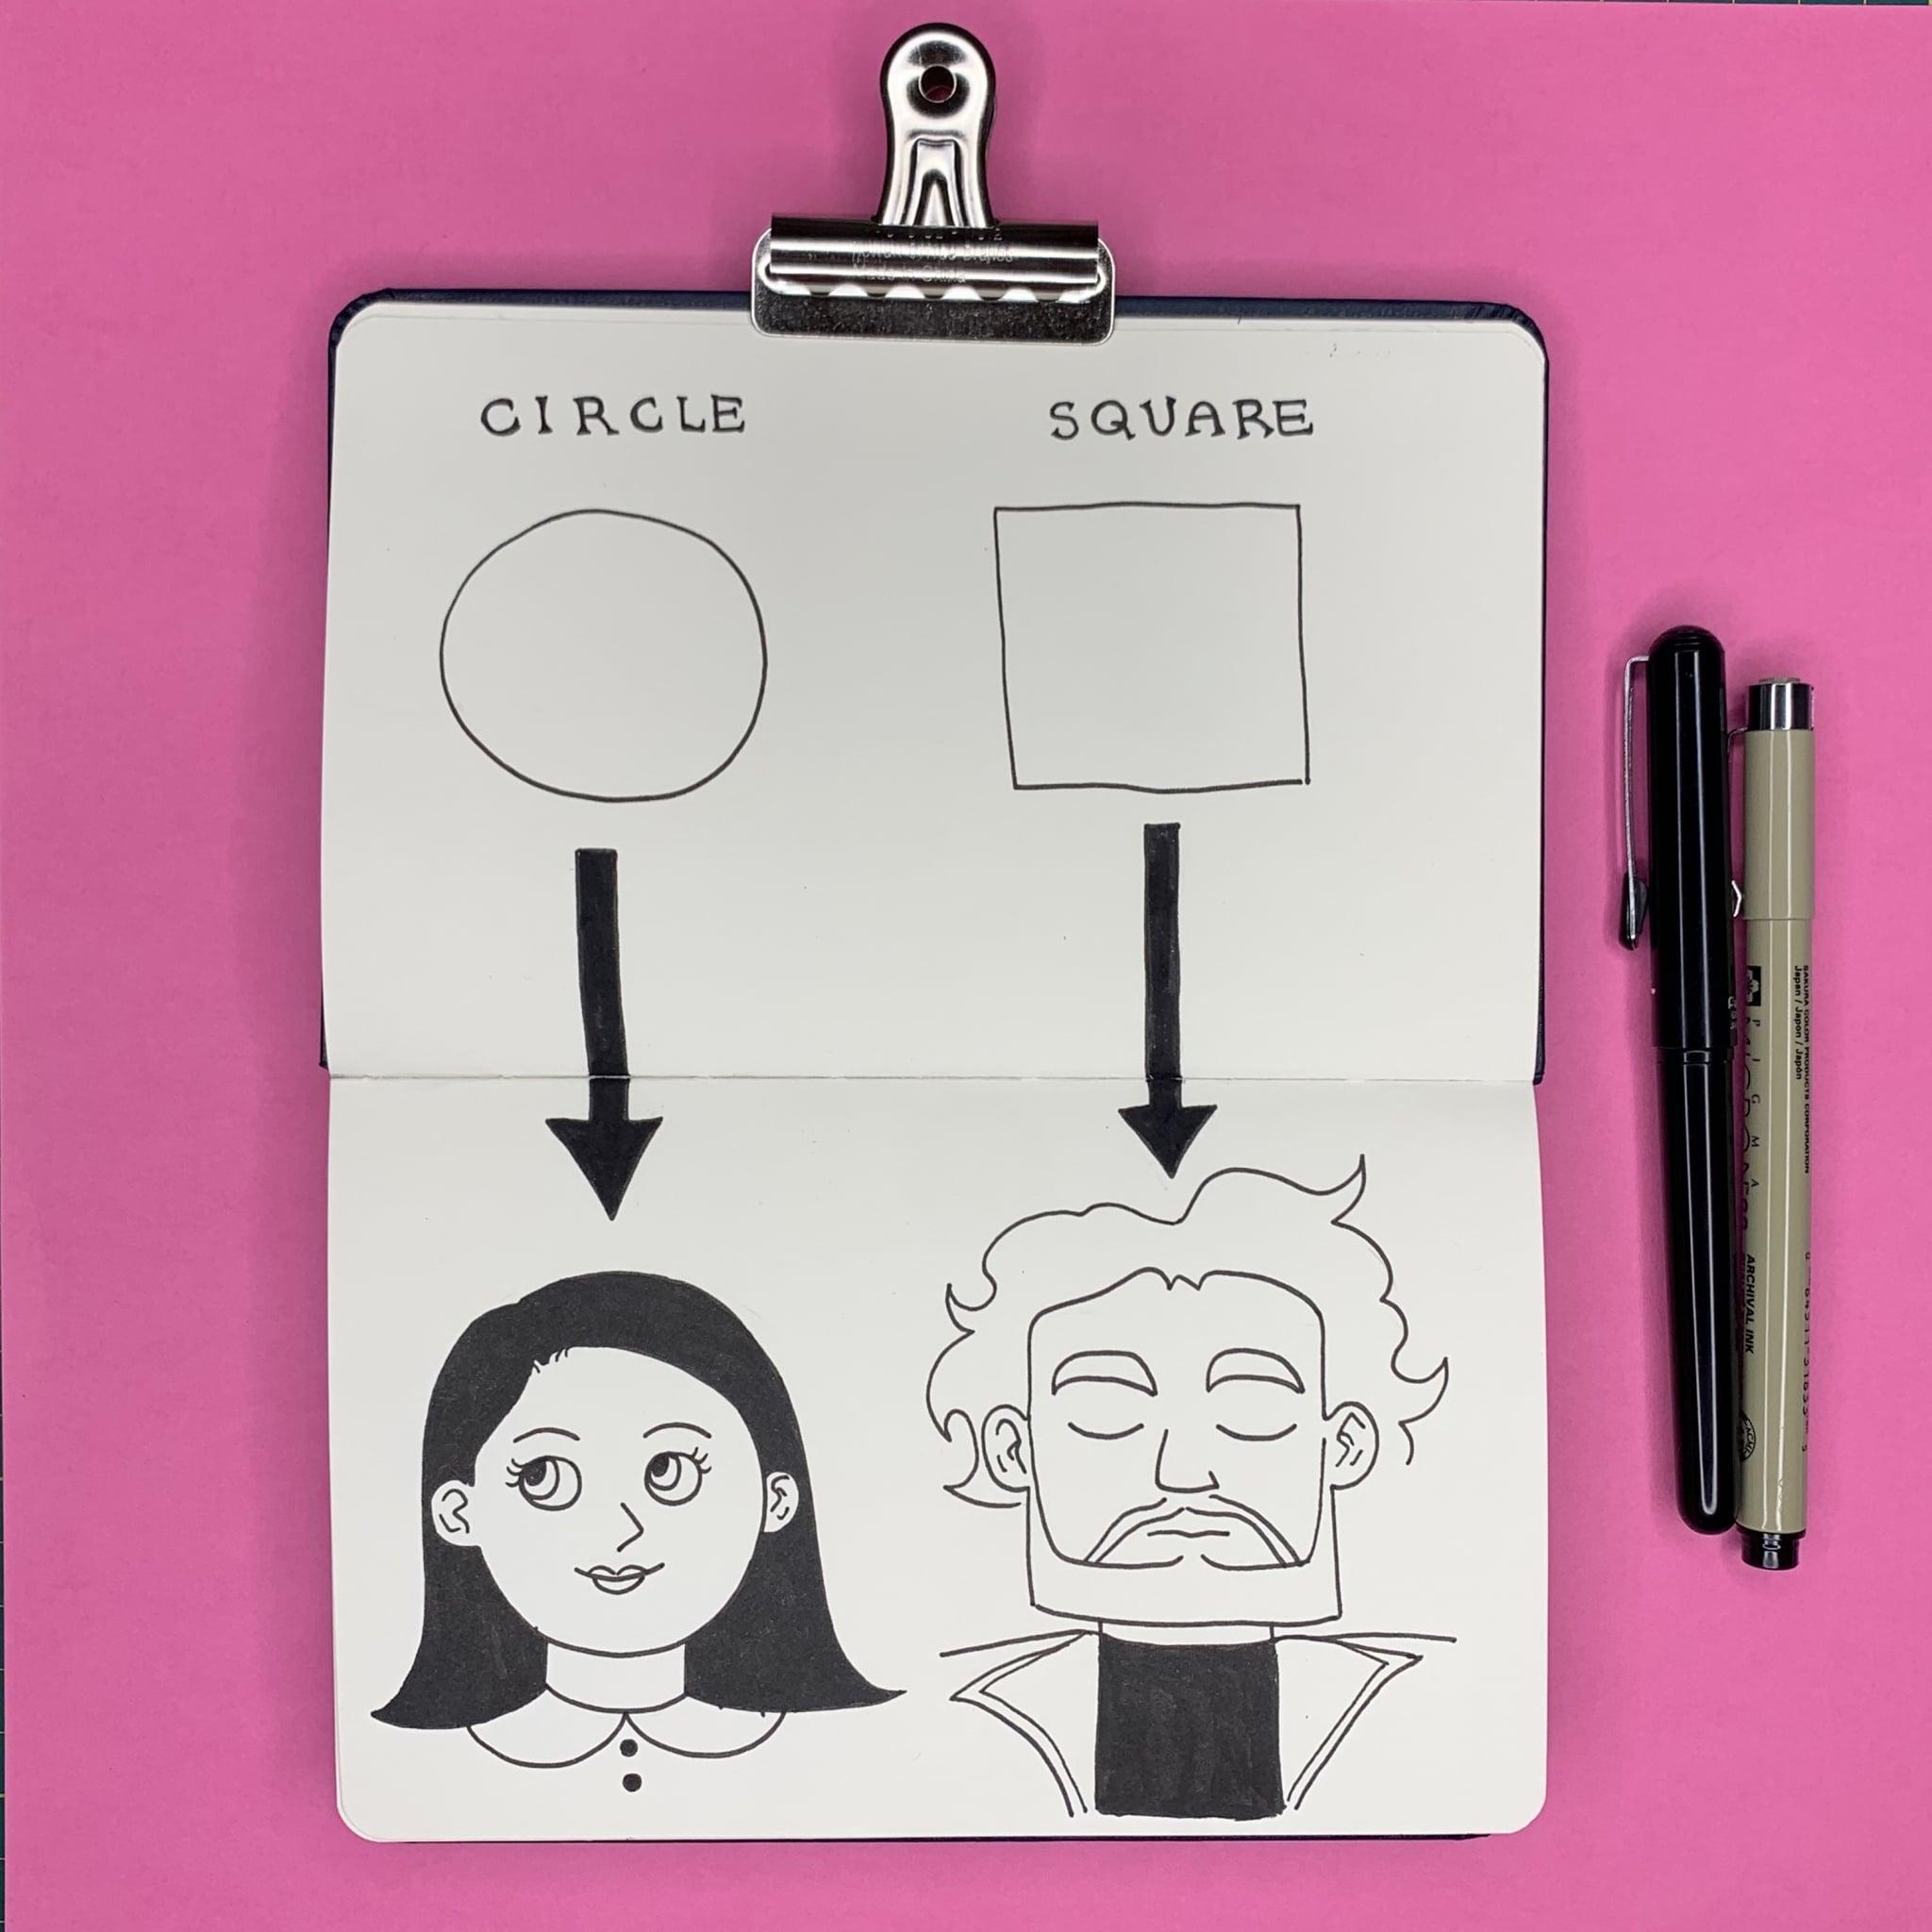 How to Draw Cartoon People